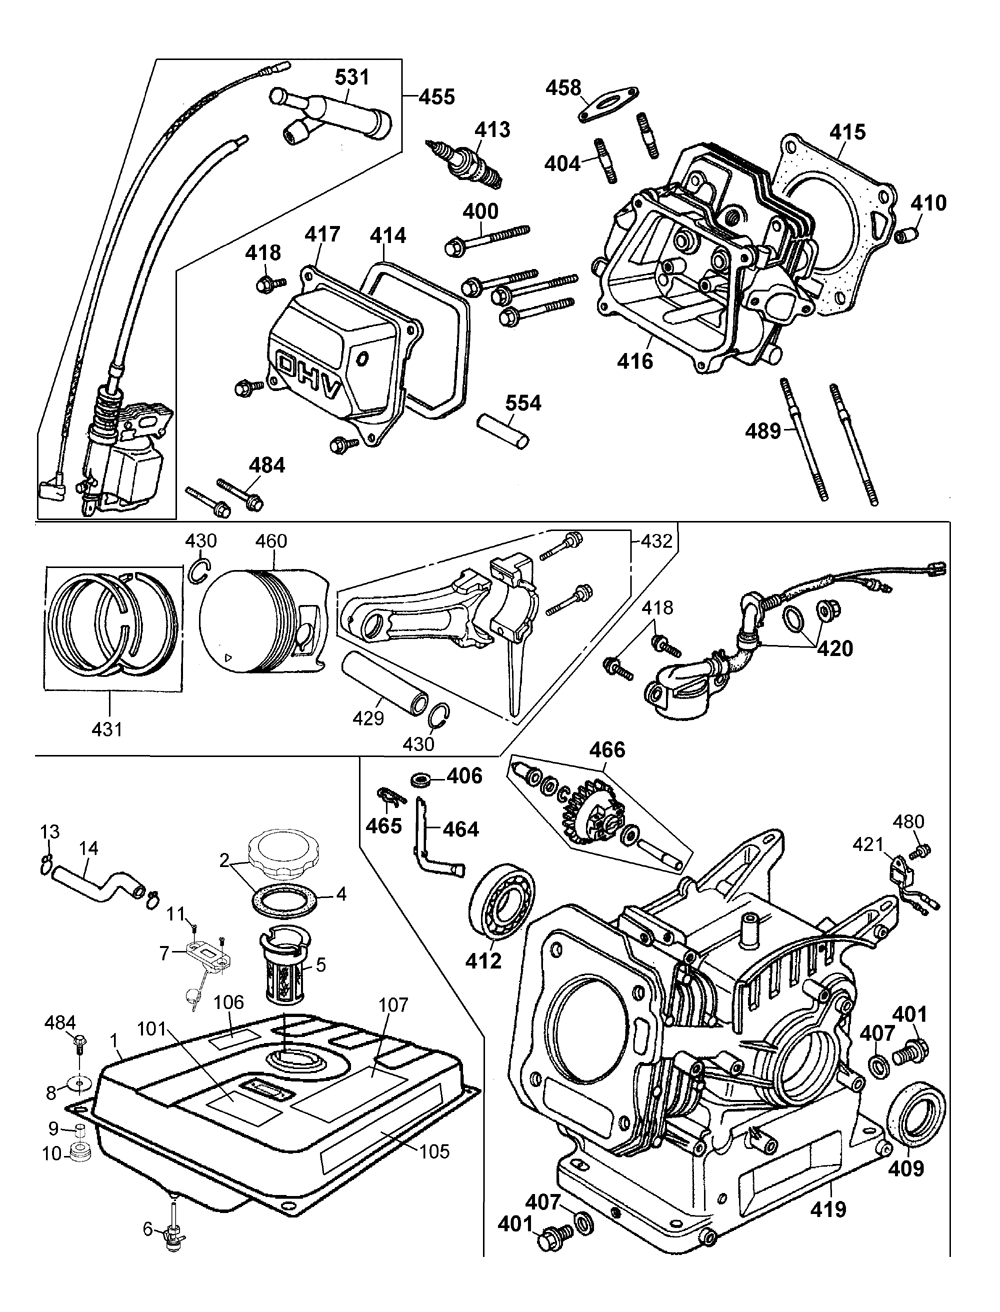 diagram also kawasaki mule wiring diagram moreover kawasaki mule 3010